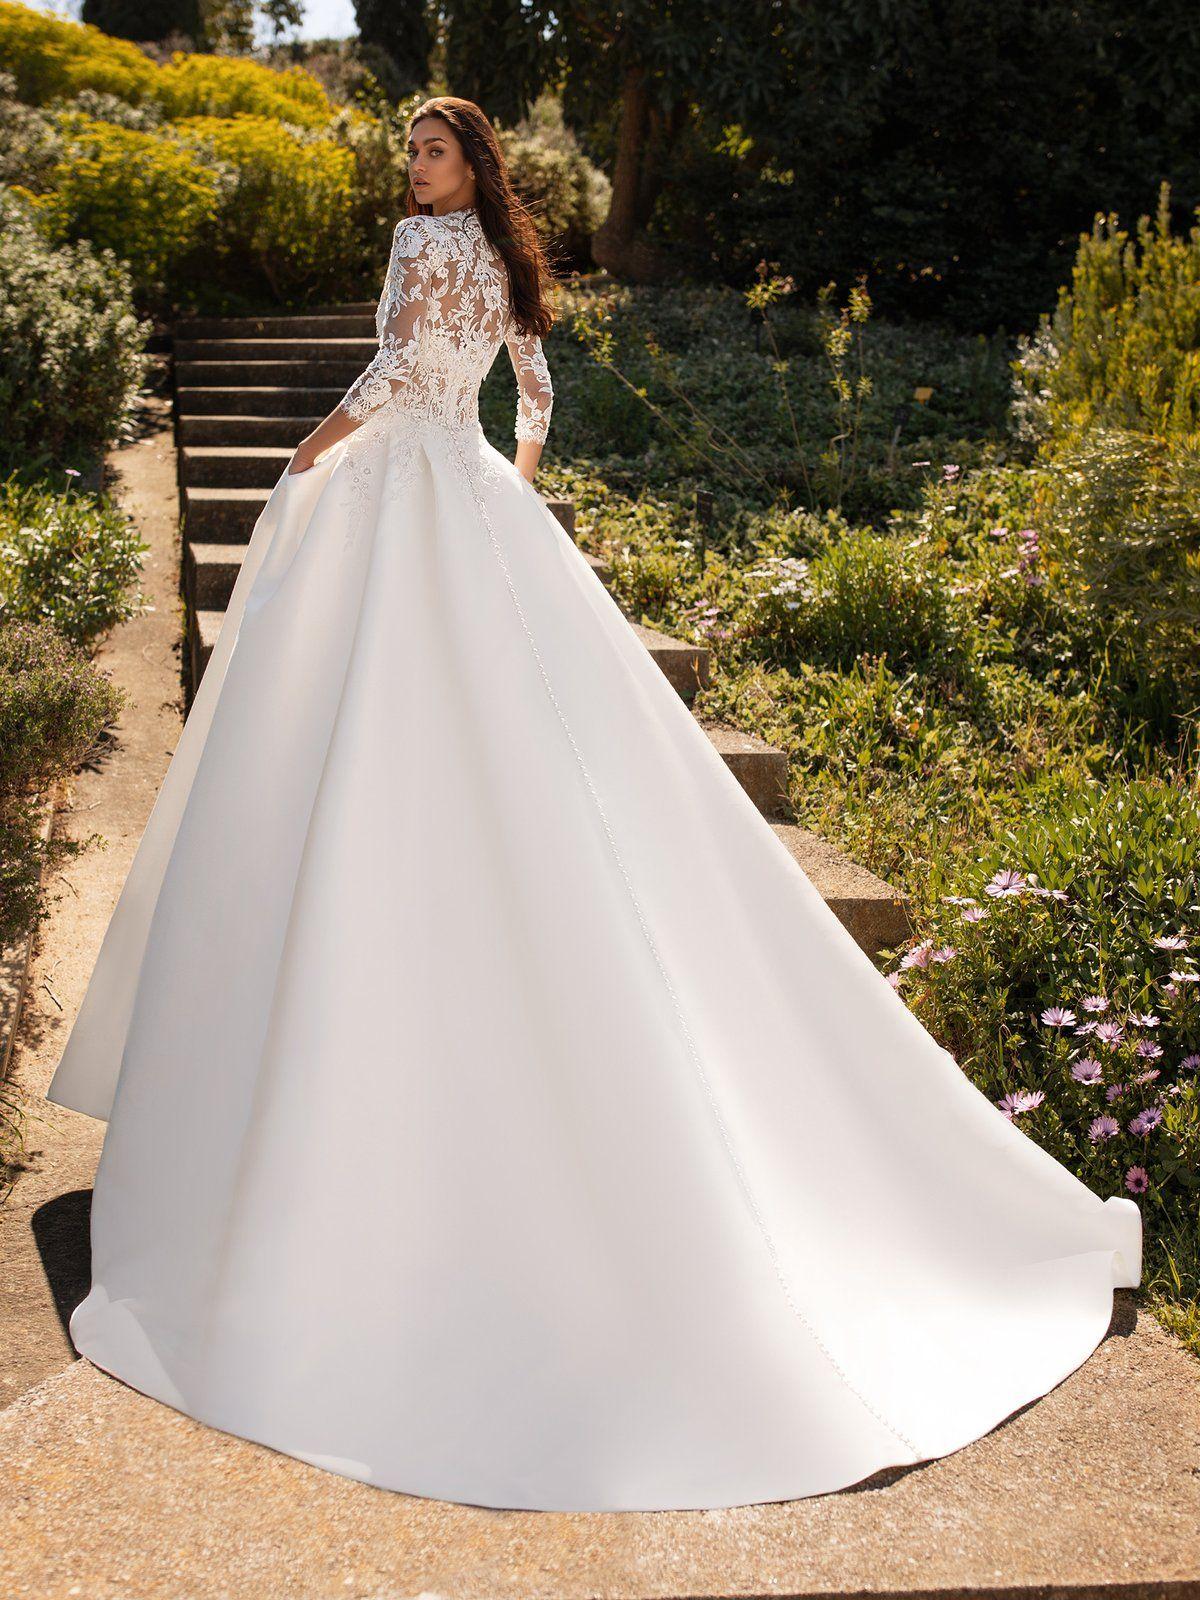 Pronovias Phoenicia In 2021 Ball Gowns Wedding Pronovias Wedding Dress Wedding Dresses Simple [ 1600 x 1200 Pixel ]